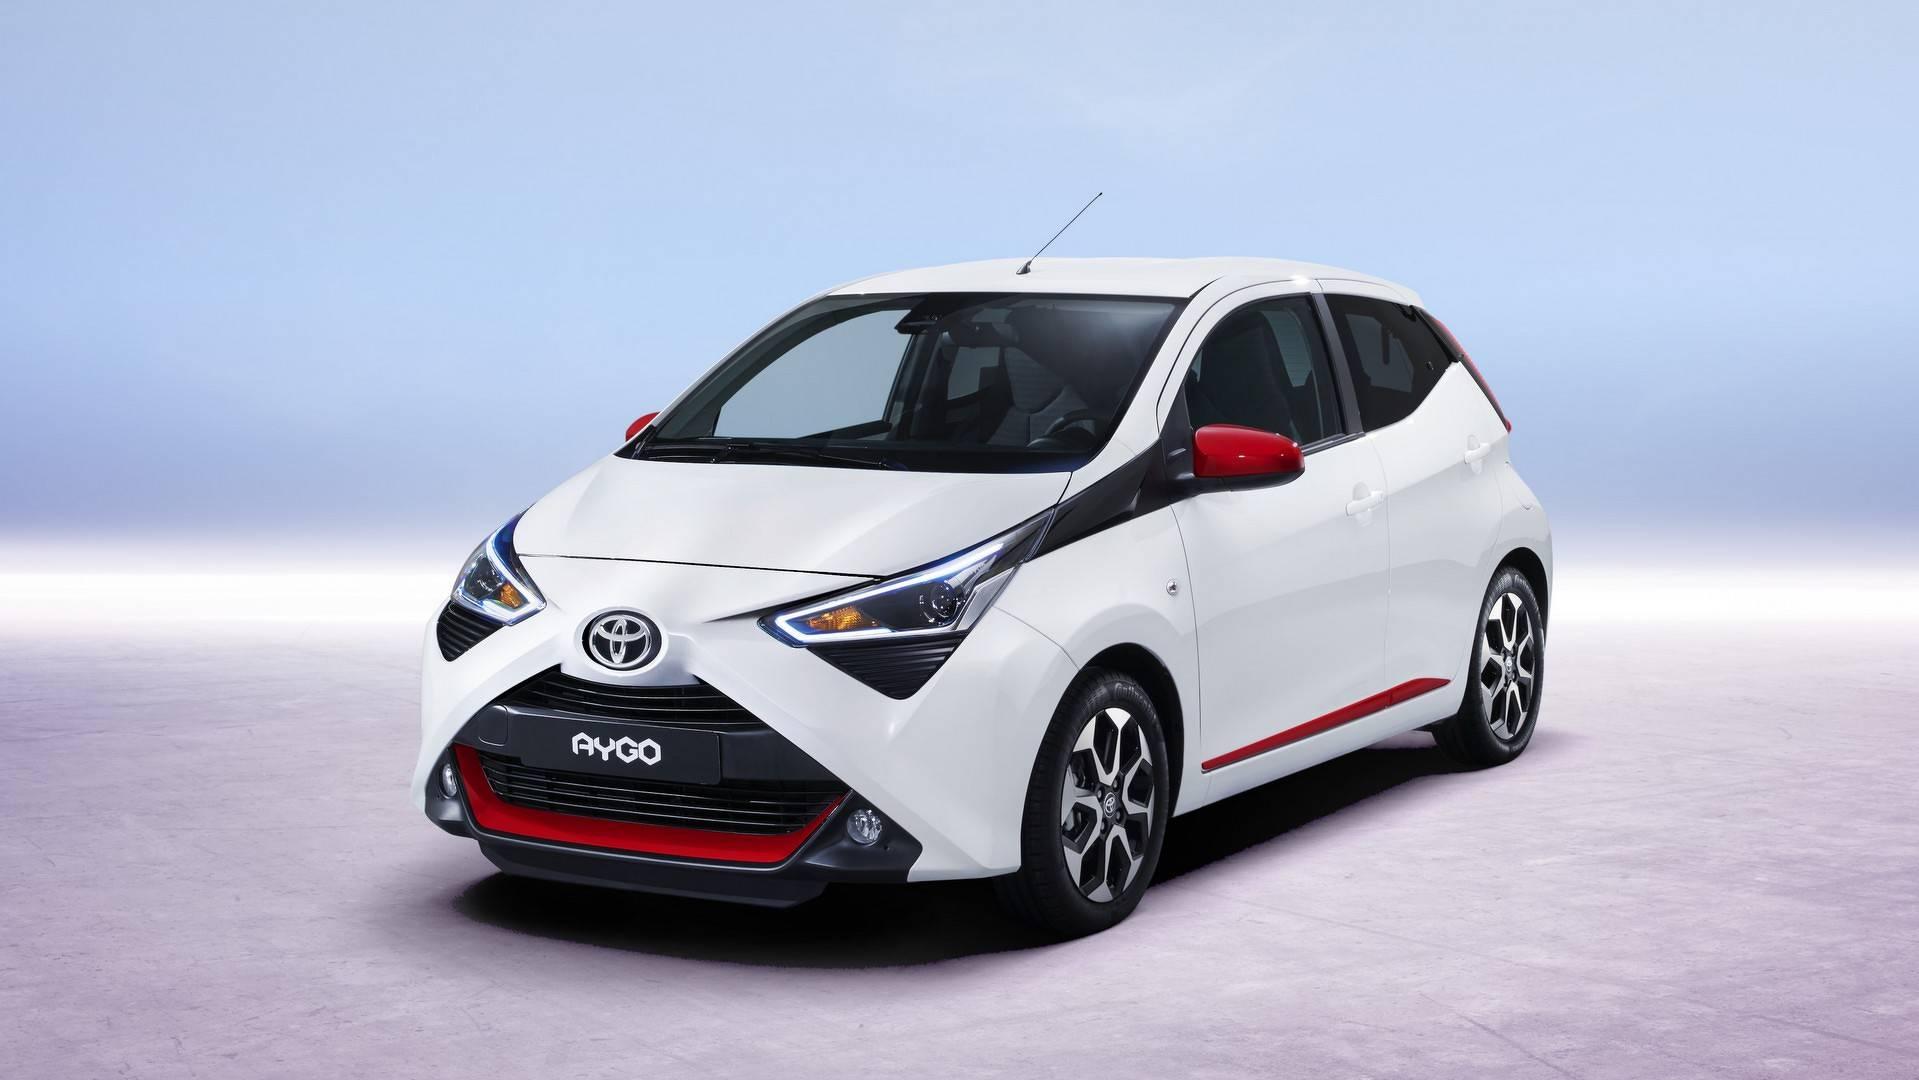 2018 Toyota Aygo Facelift Previews Ahead of Geneva 7